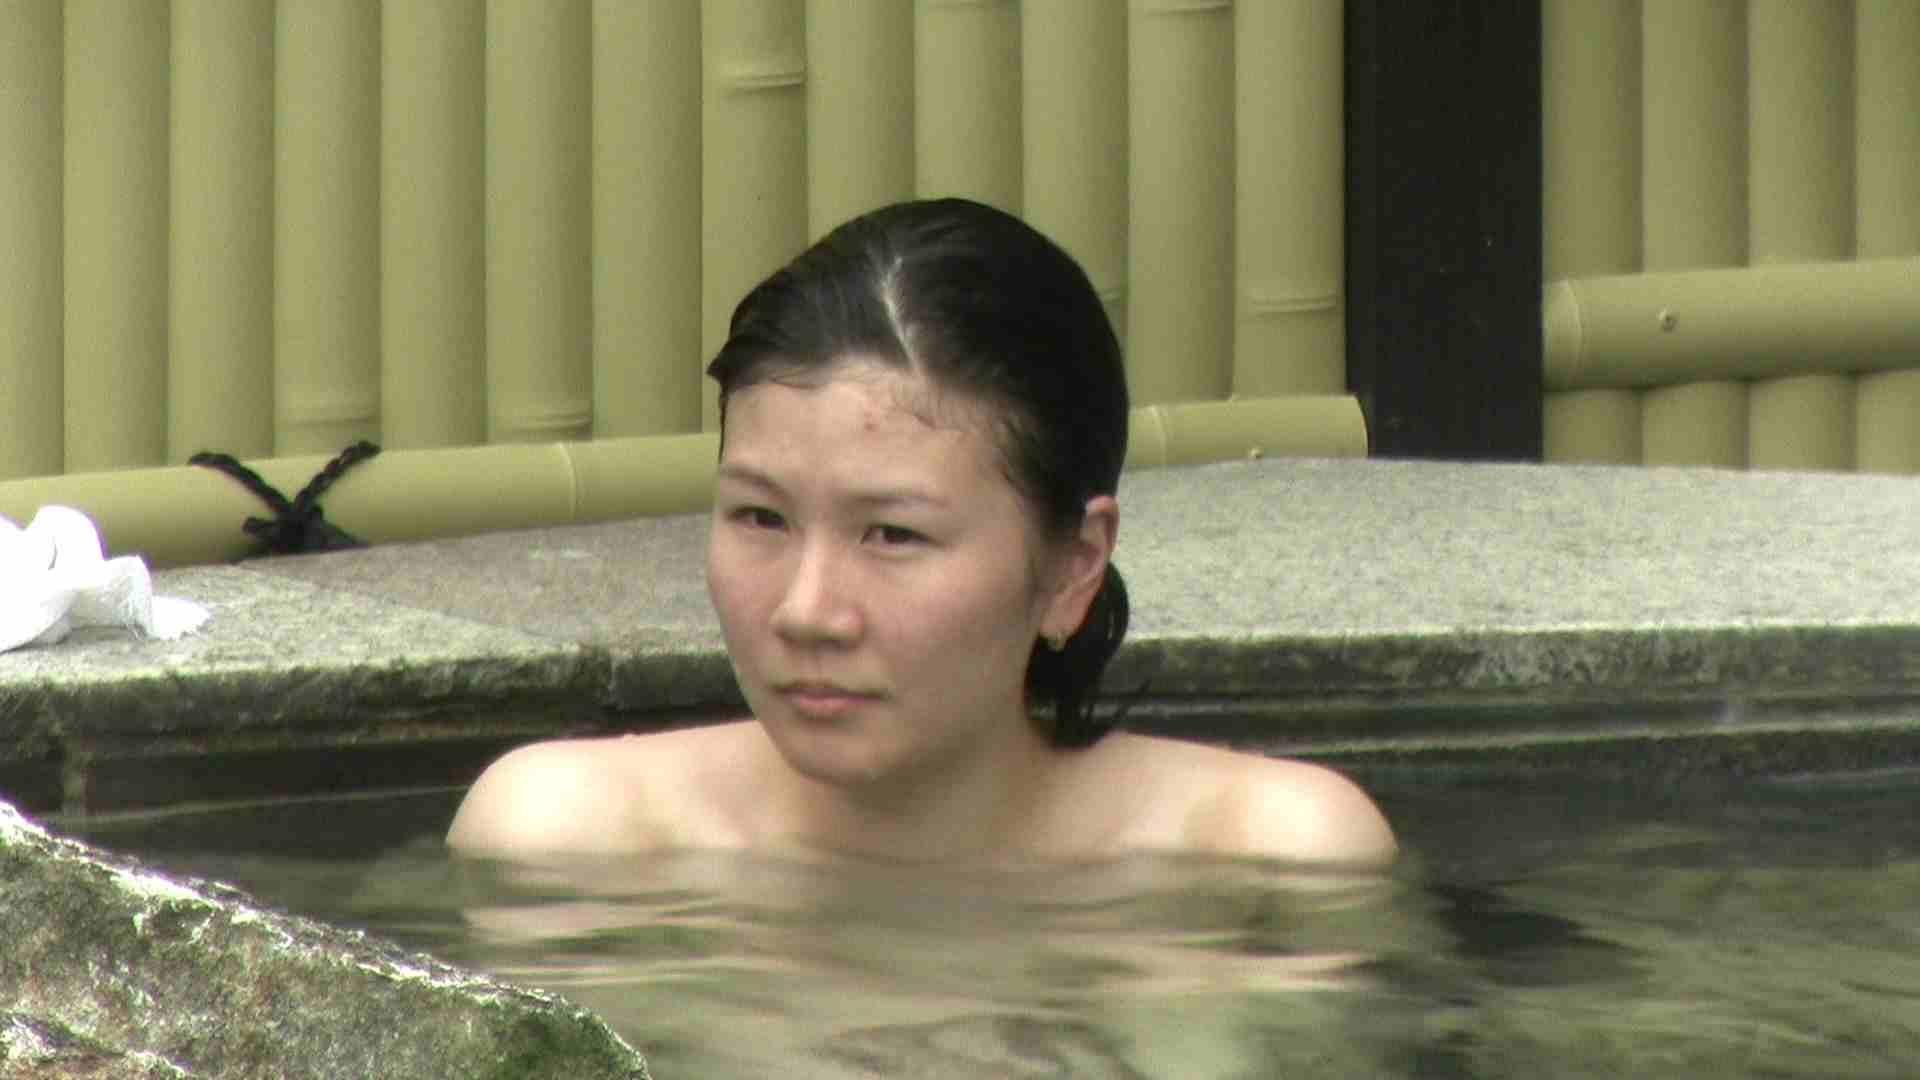 Aquaな露天風呂Vol.187 盗撮   HなOL  96pic 33